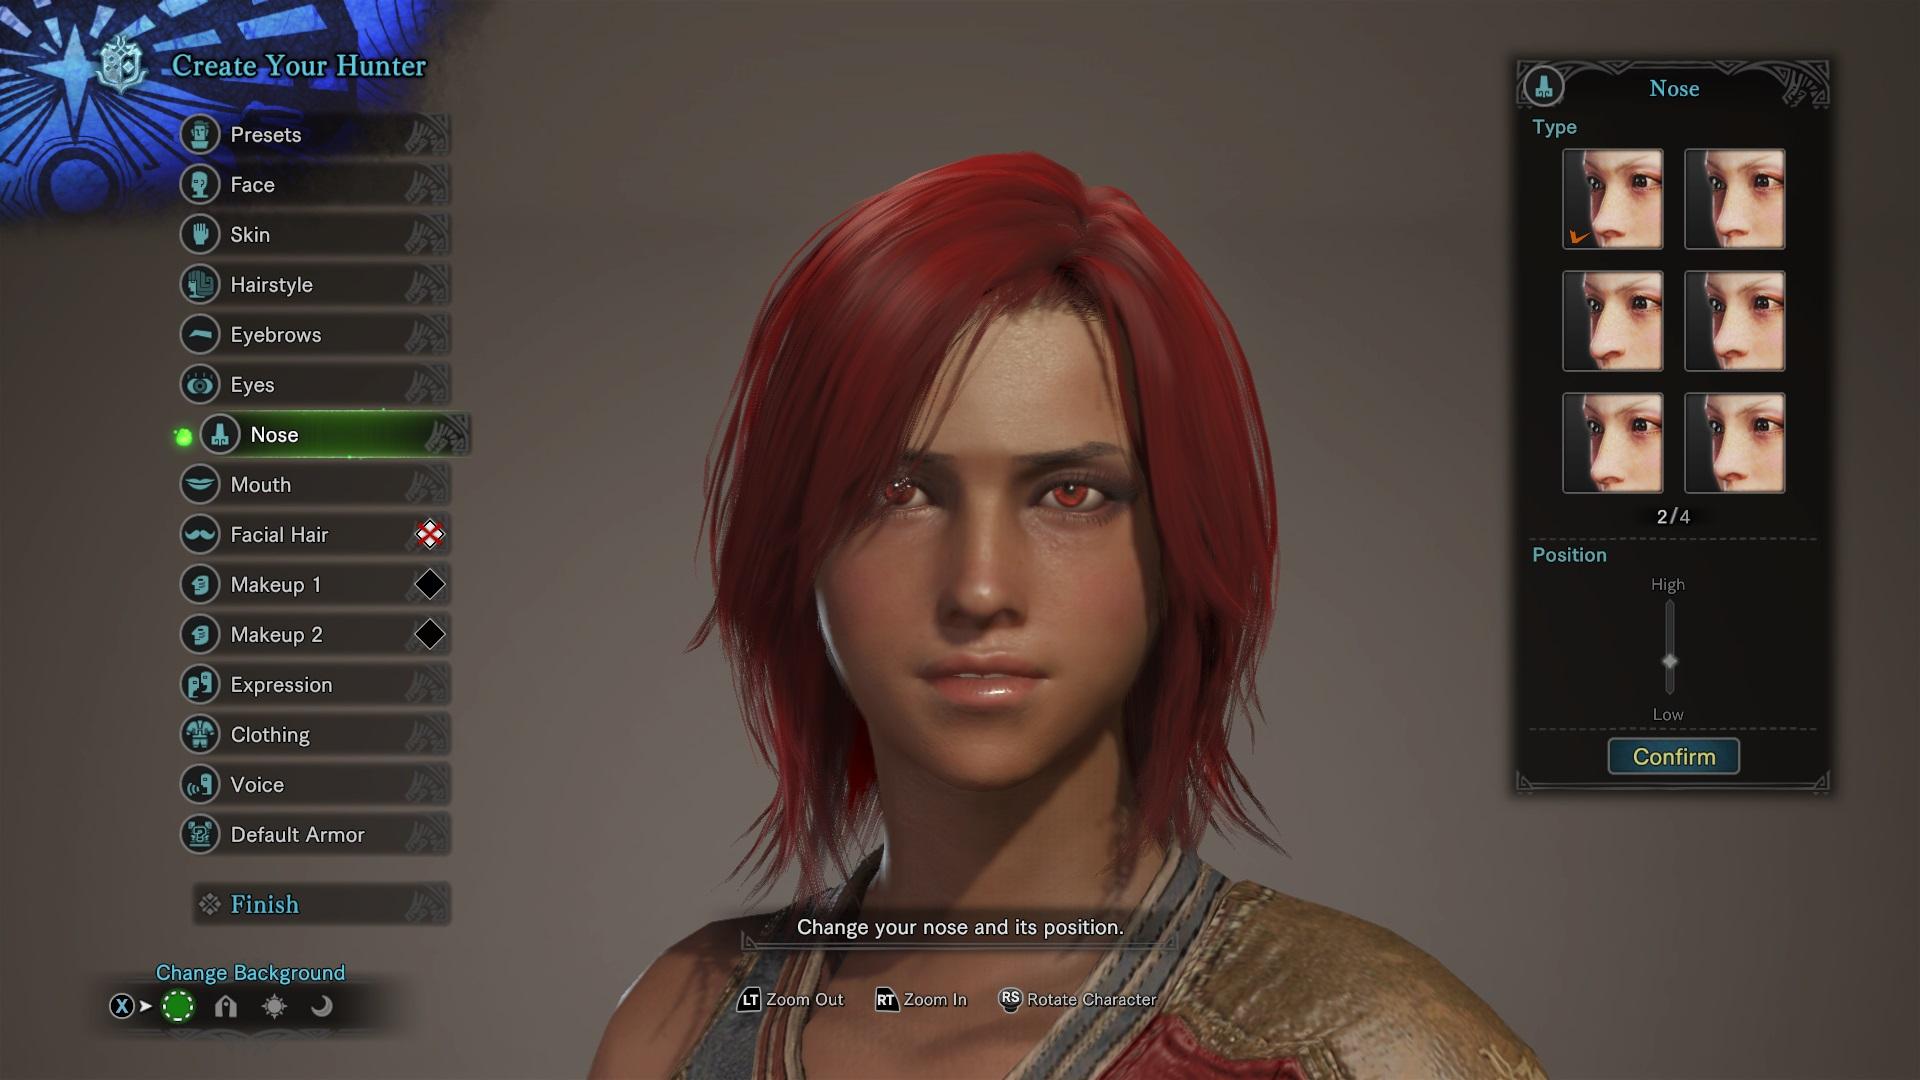 Monster Hunter World character customization is irking some